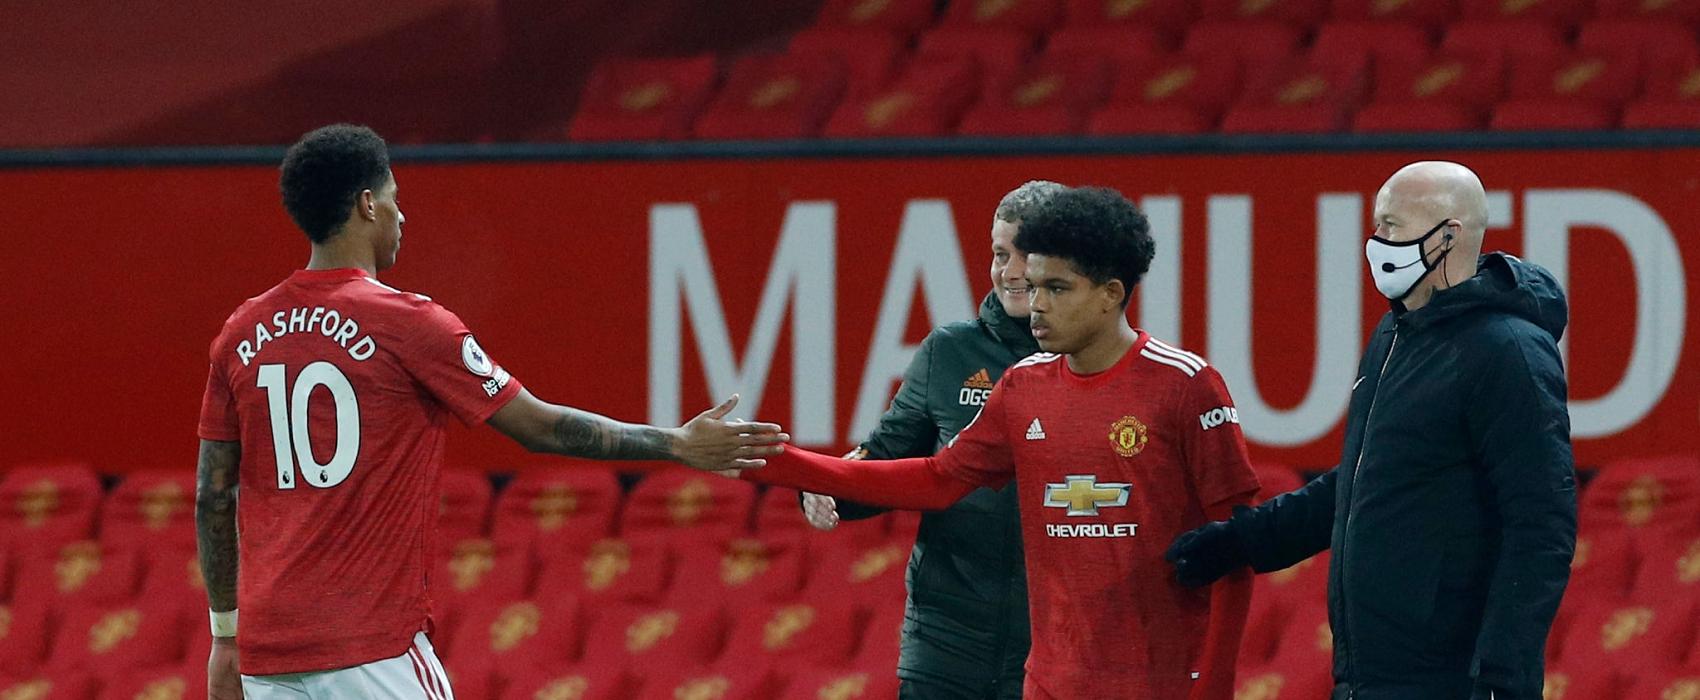 Punkty dyskusji po meczu Manchester United vs. Newcastle United   ManUtd.pl - Serwis kibiców klubu Manchester United